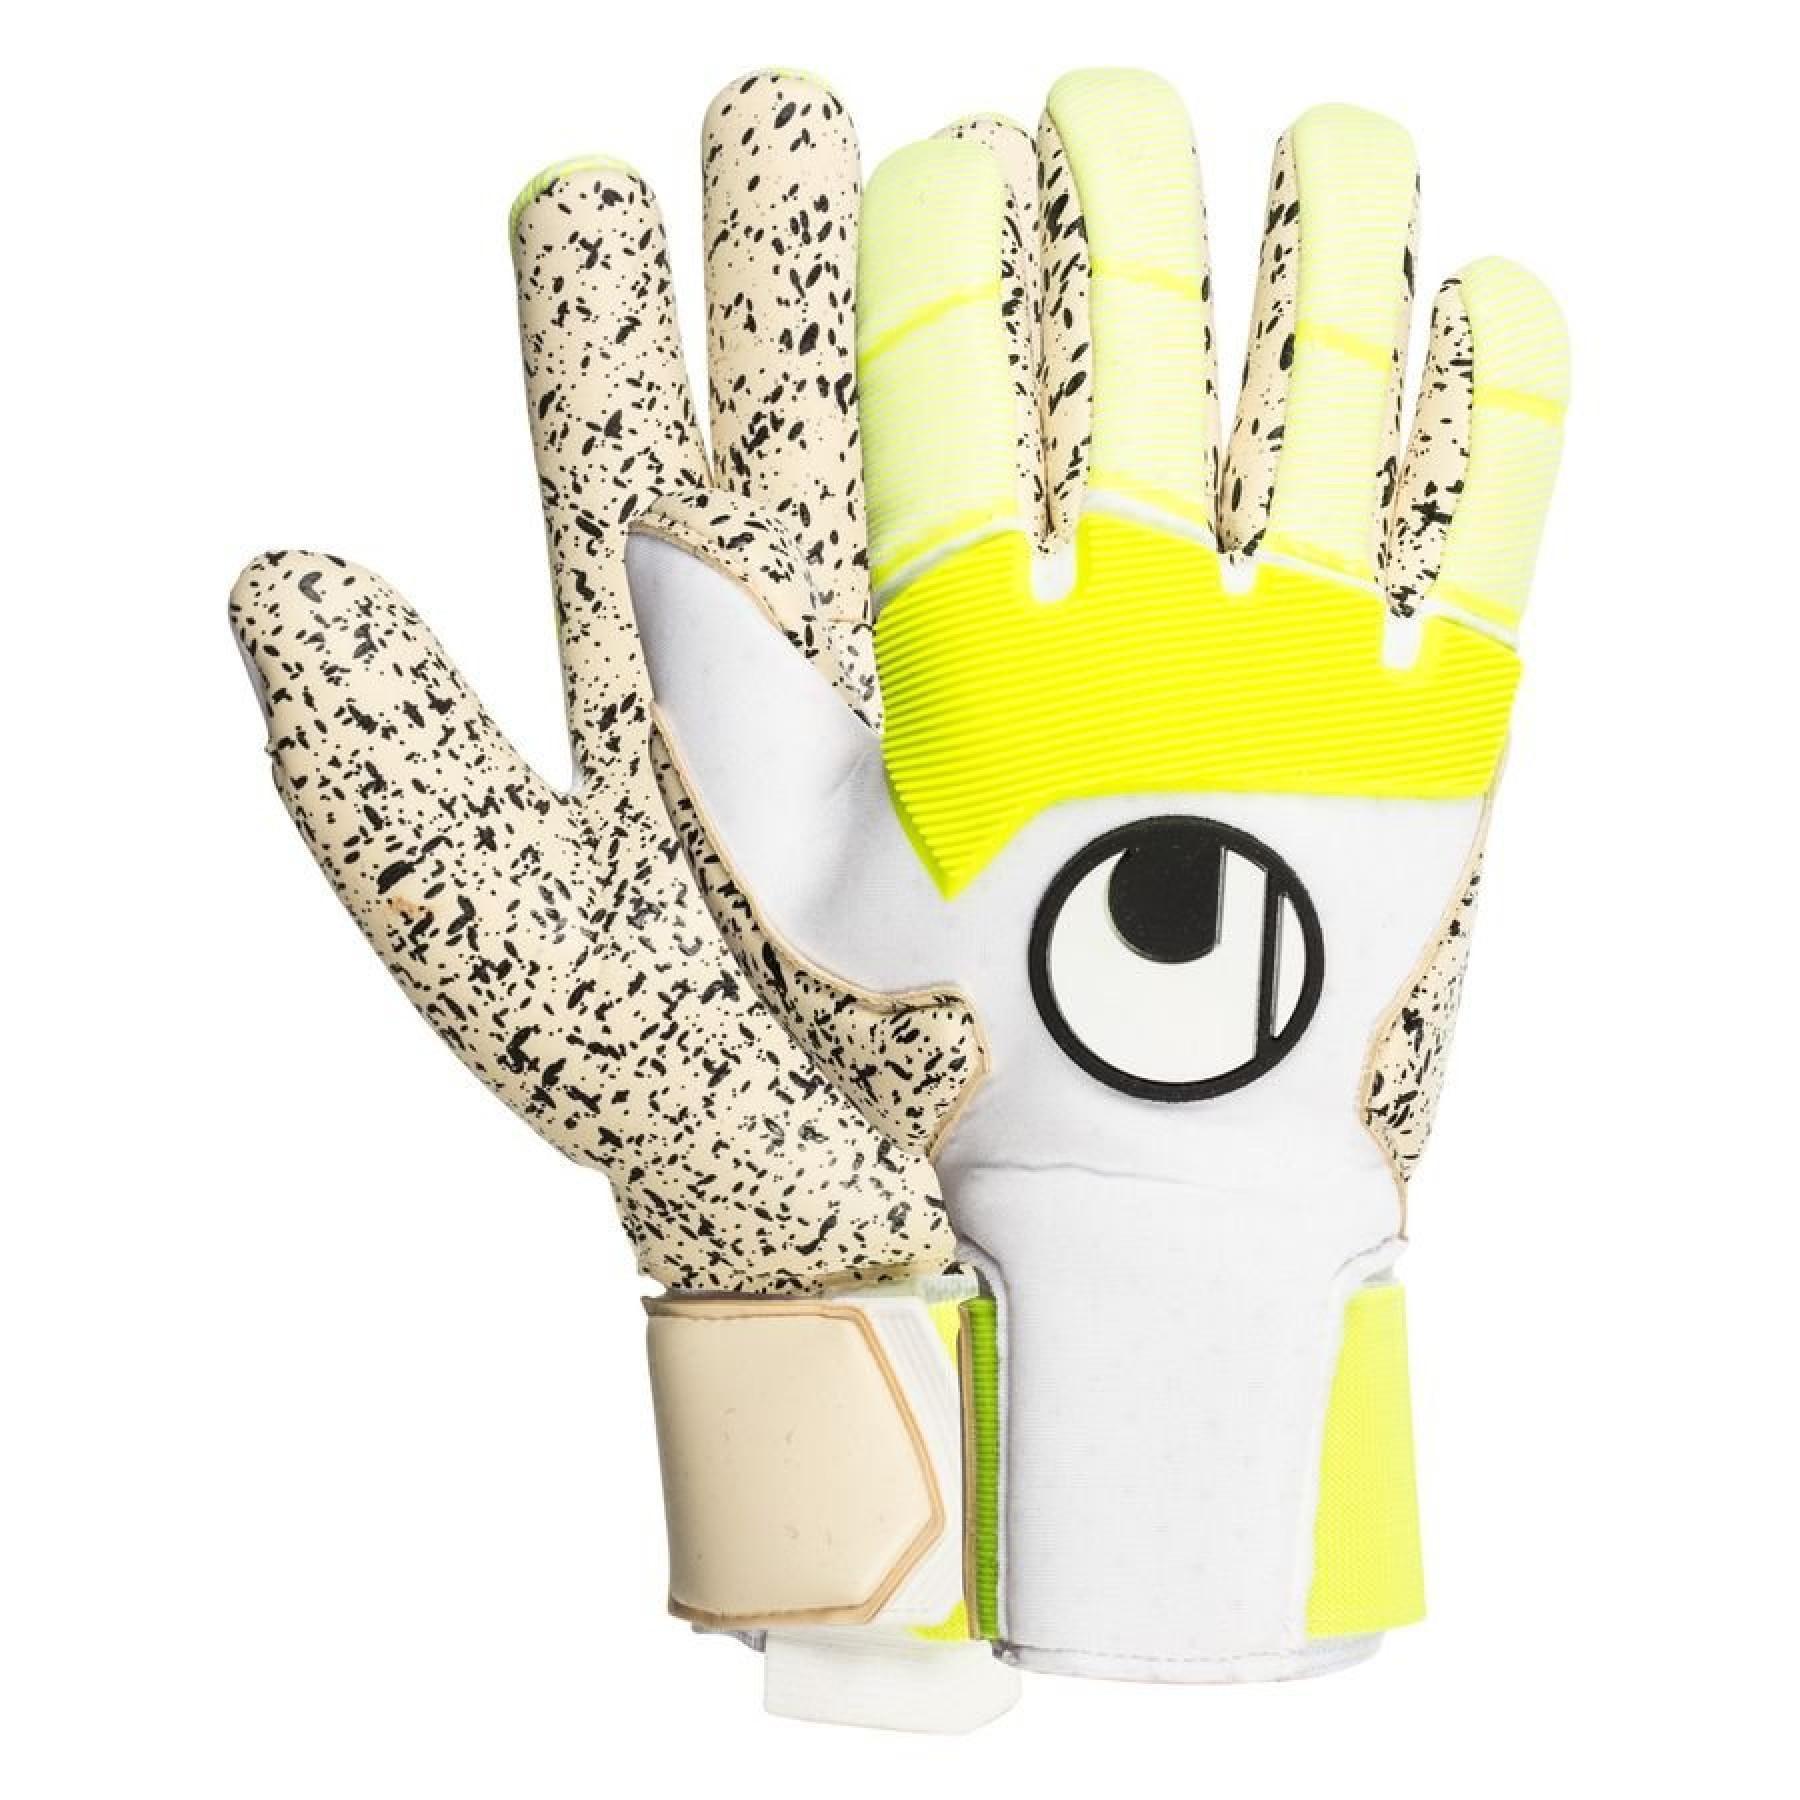 Guanti Uhlsport Pure Alliance SuperGrip+ Finger Surround Gloves